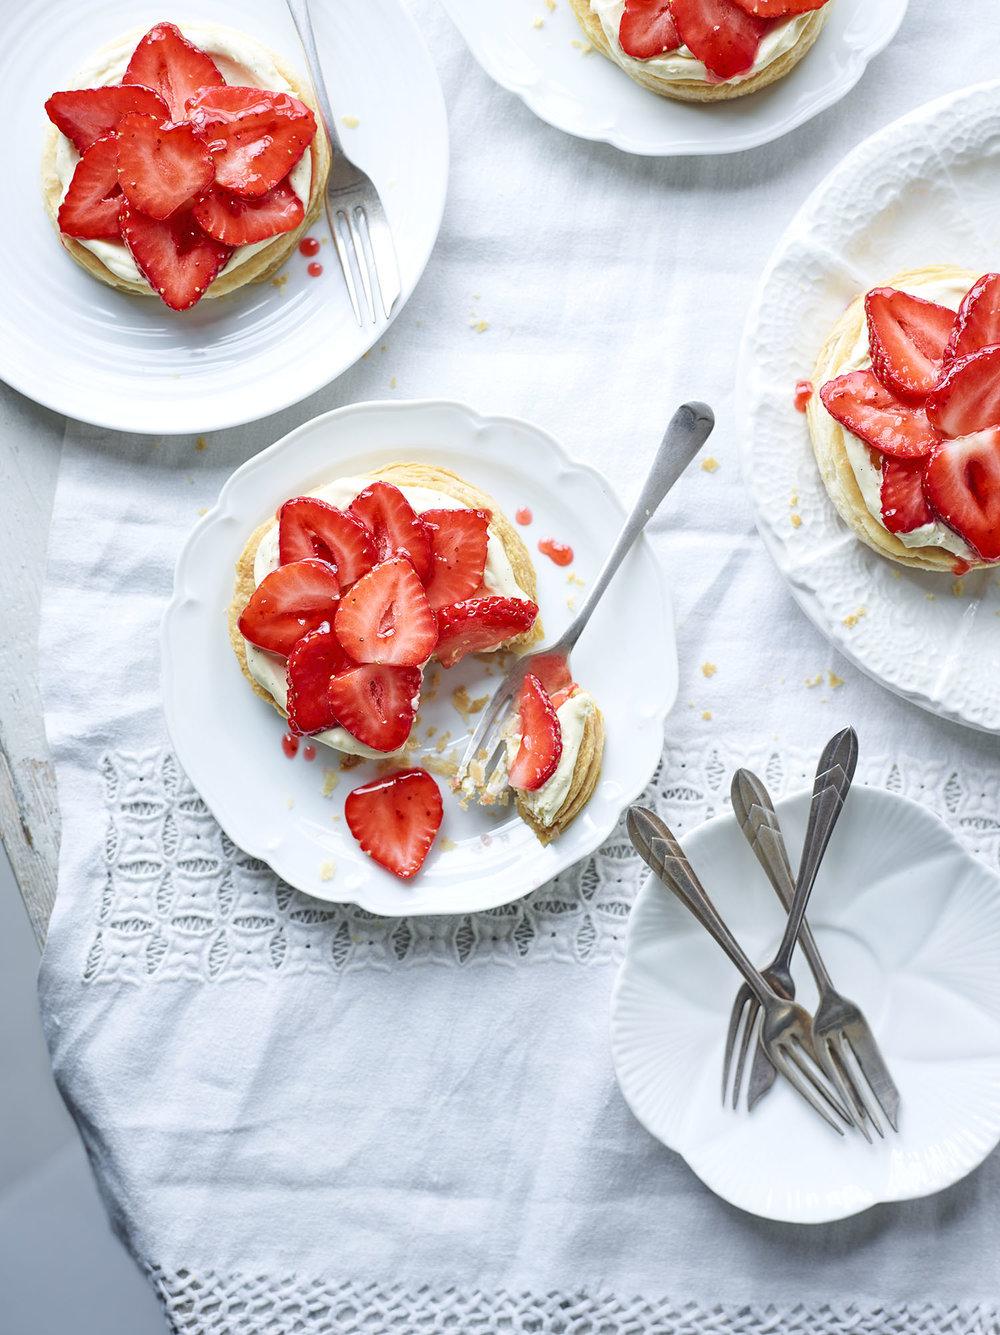 Cheat's Strawberry Tarts Photograph Maja Smend Prop Styling Olivia Wardle Recipe Madeline Burkitt